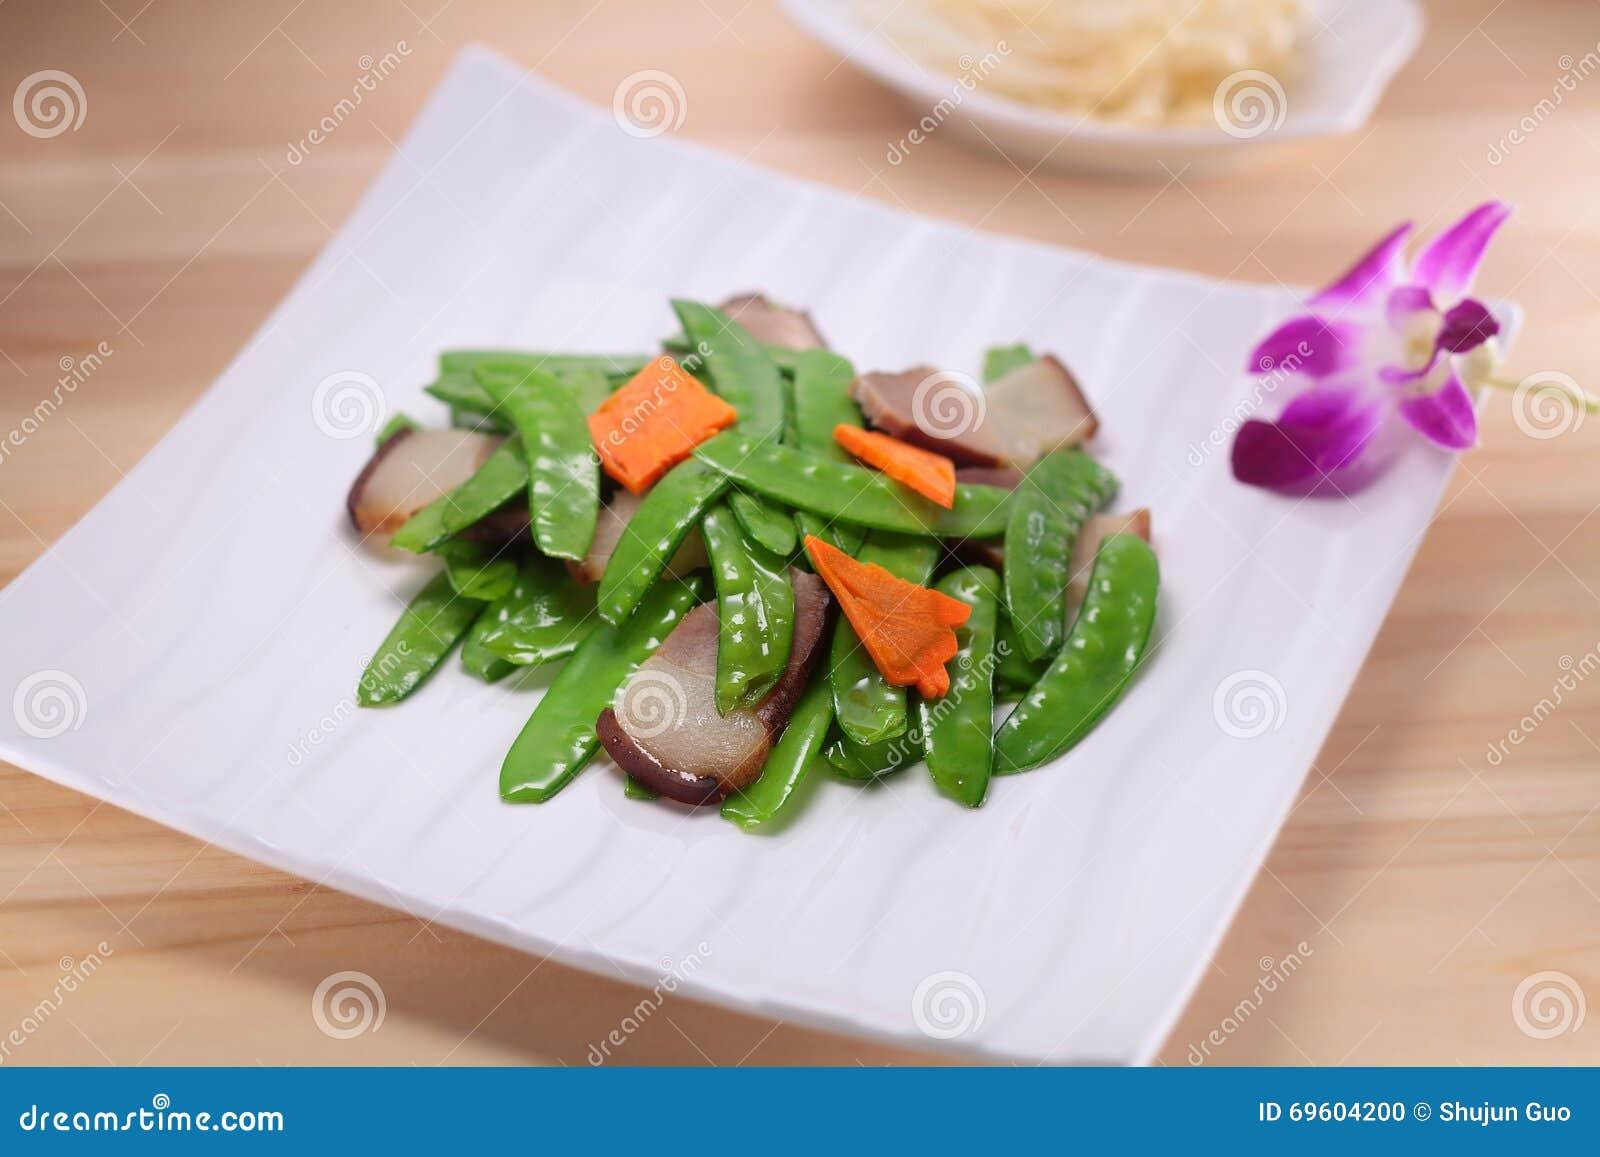 La culture chinoise de nourriture